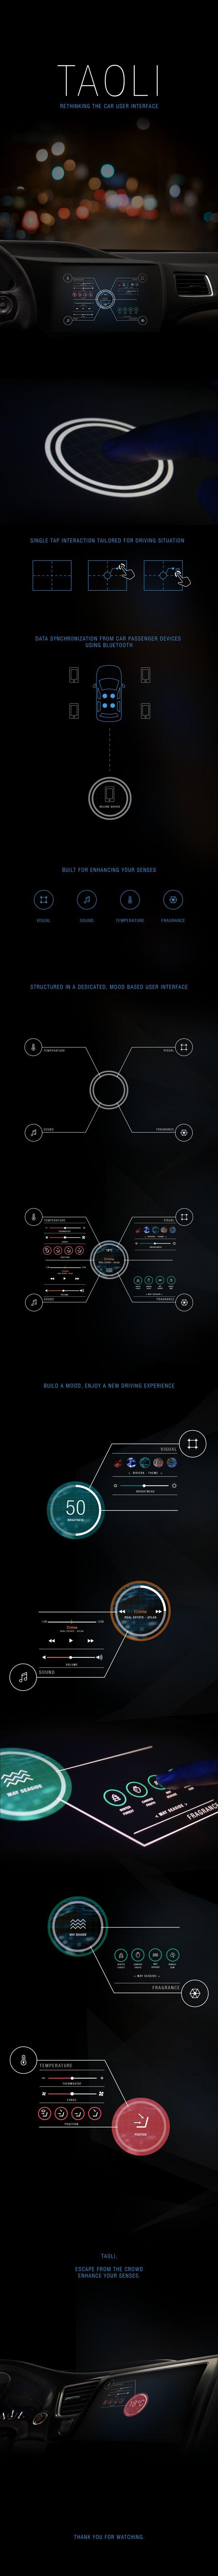 TAOLI - A car user interface concept on Behance